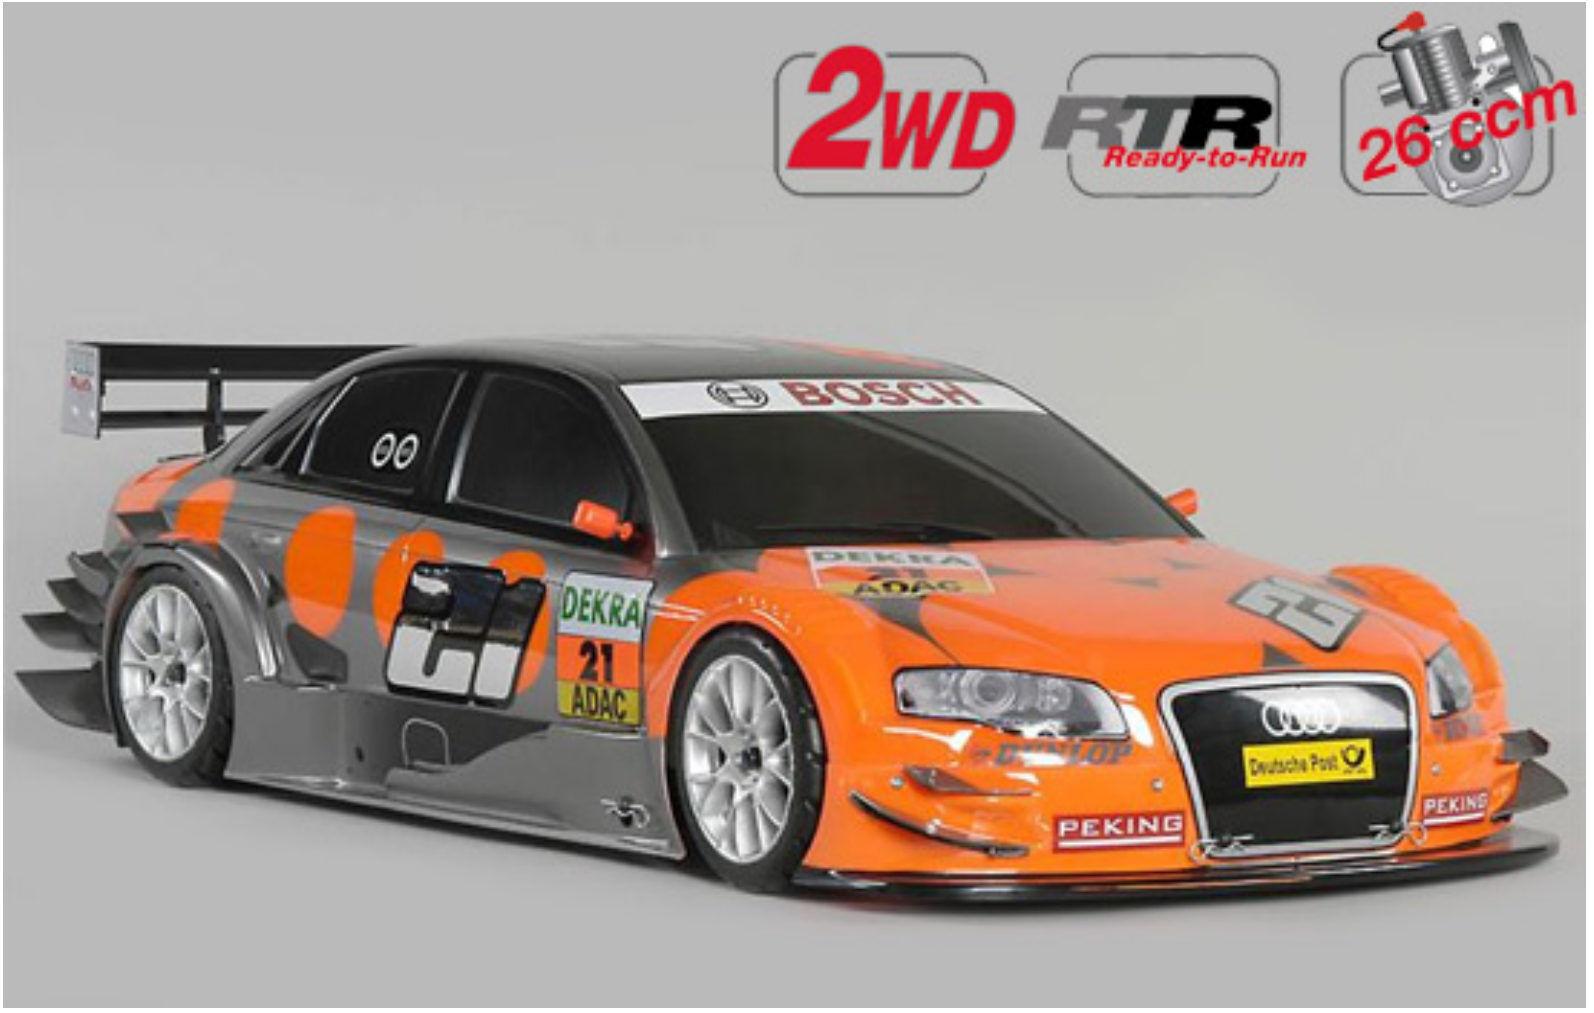 FG Modellsport NEW Sportsline 2WD RTR AUDI A4 Albers 26 CCM 164147r